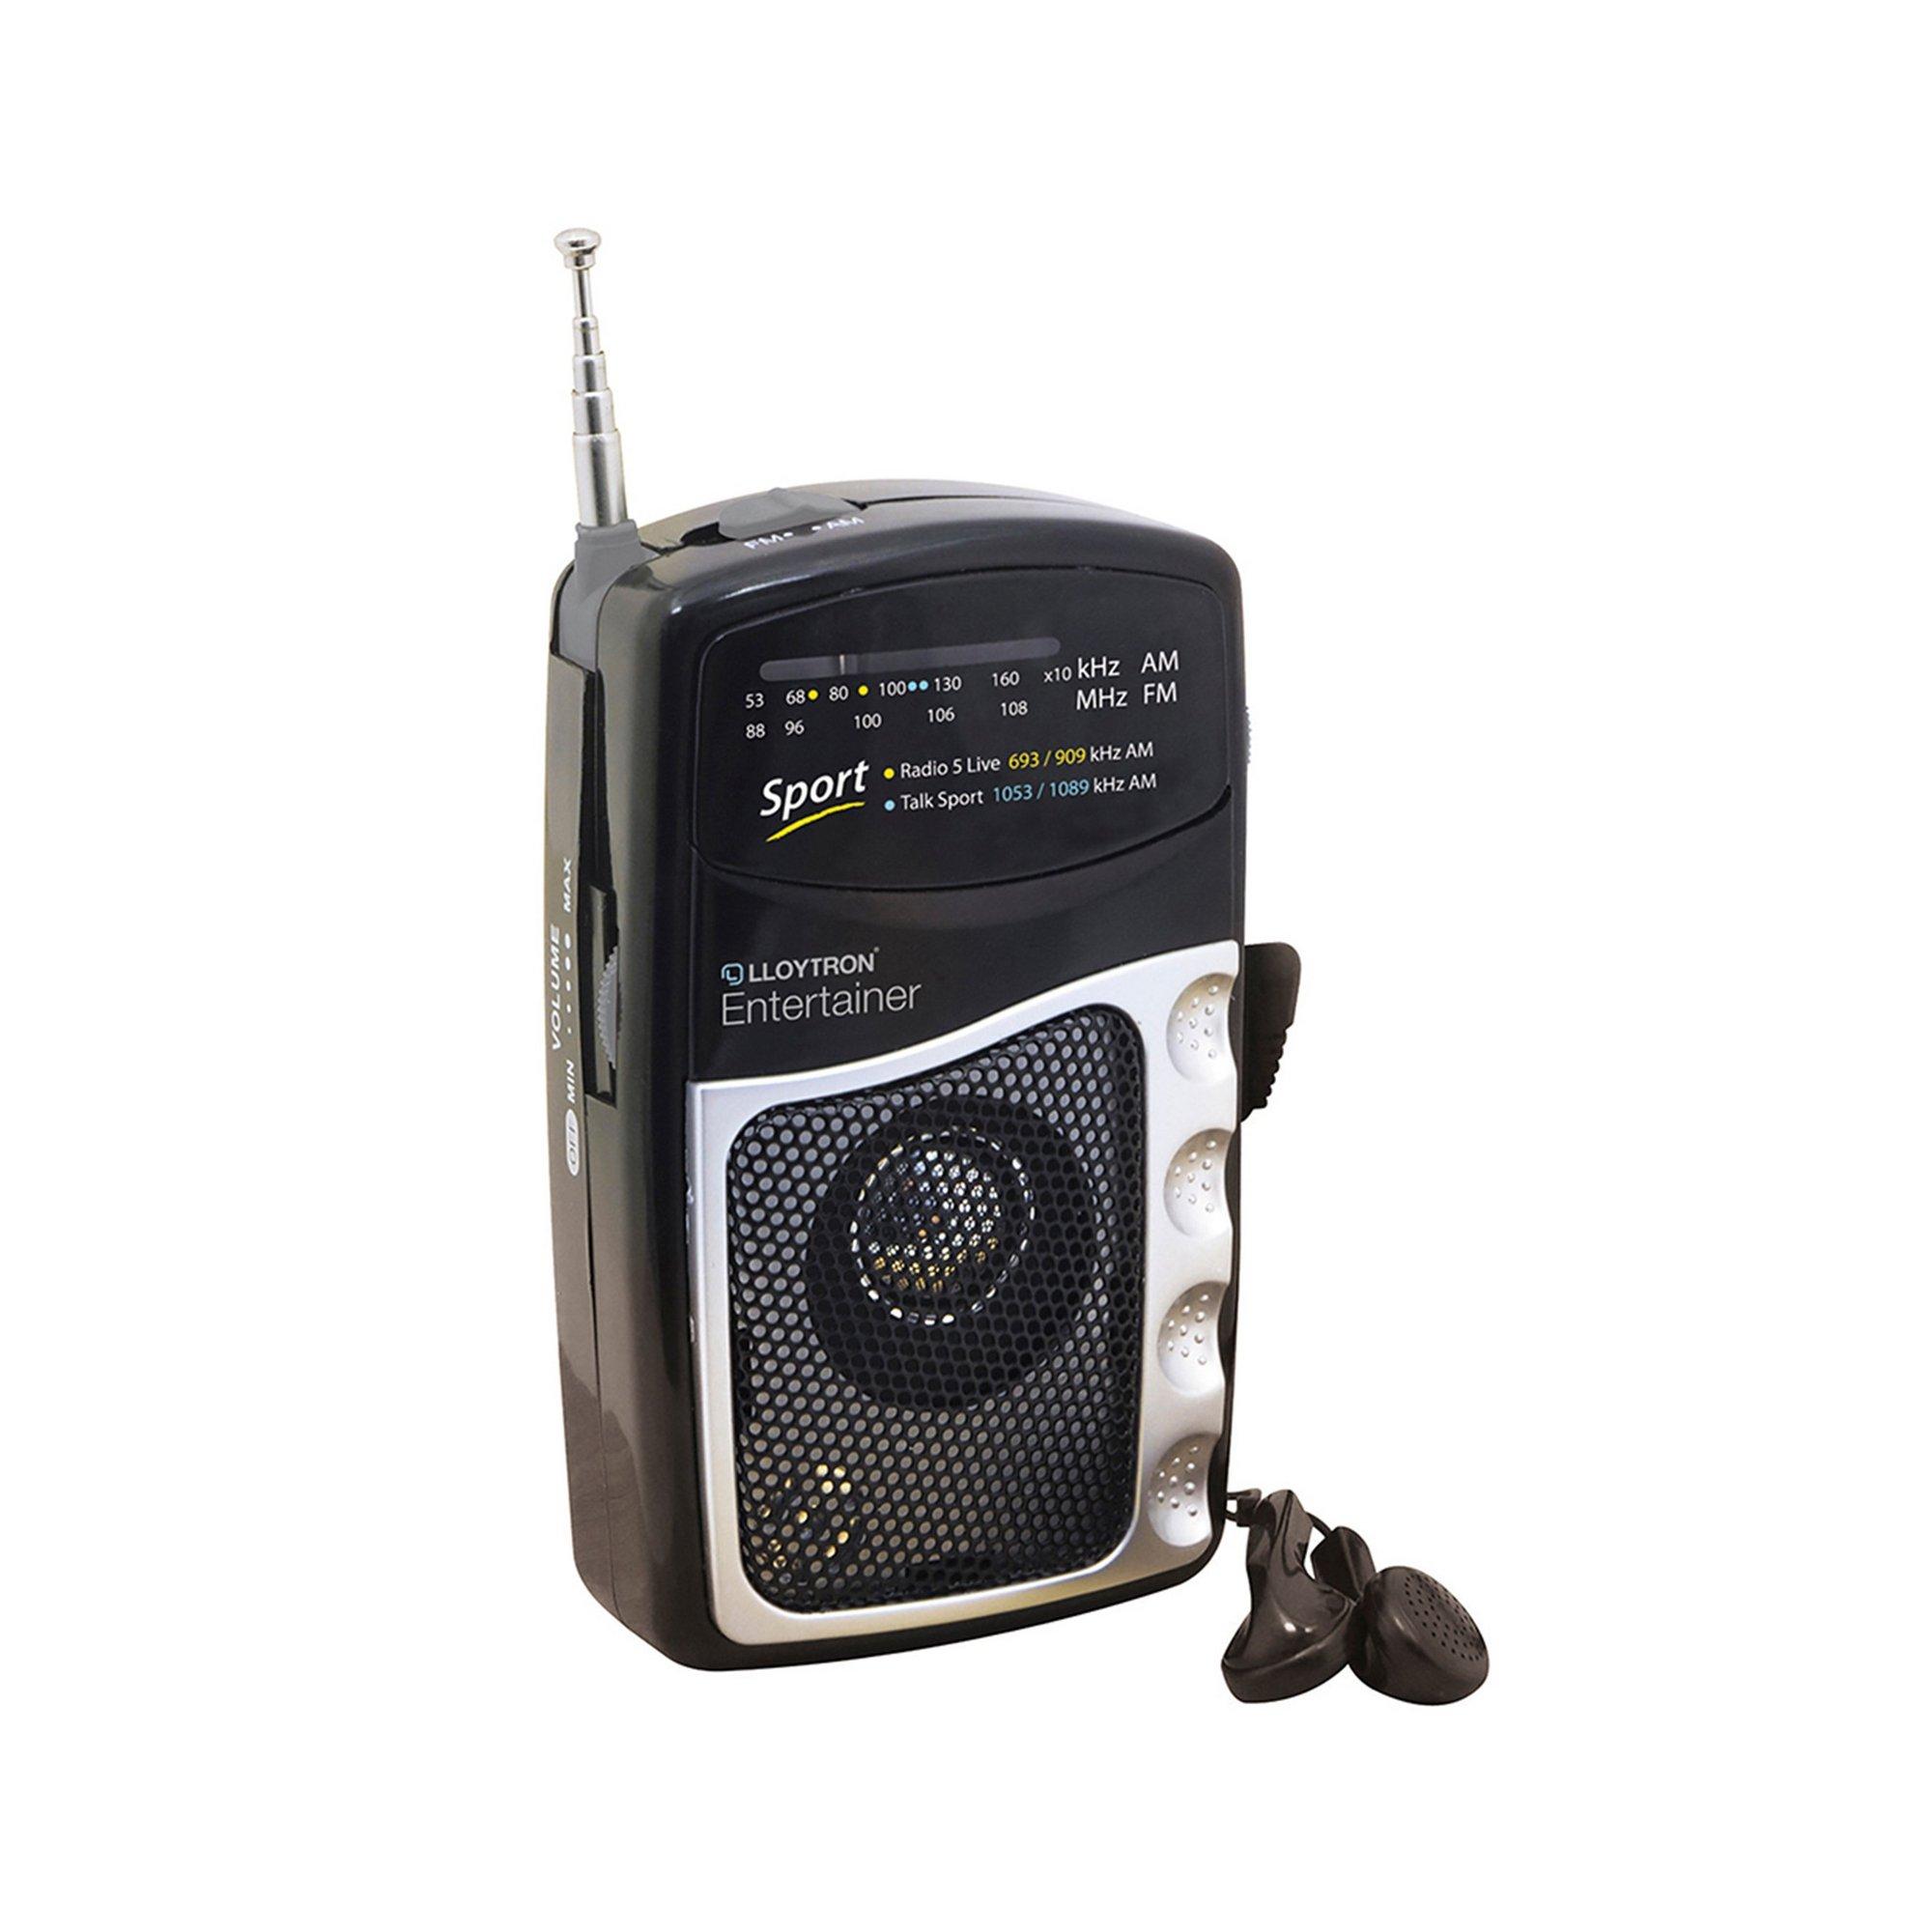 Image of Lloytron Entertainer AM/FM Personal Radio